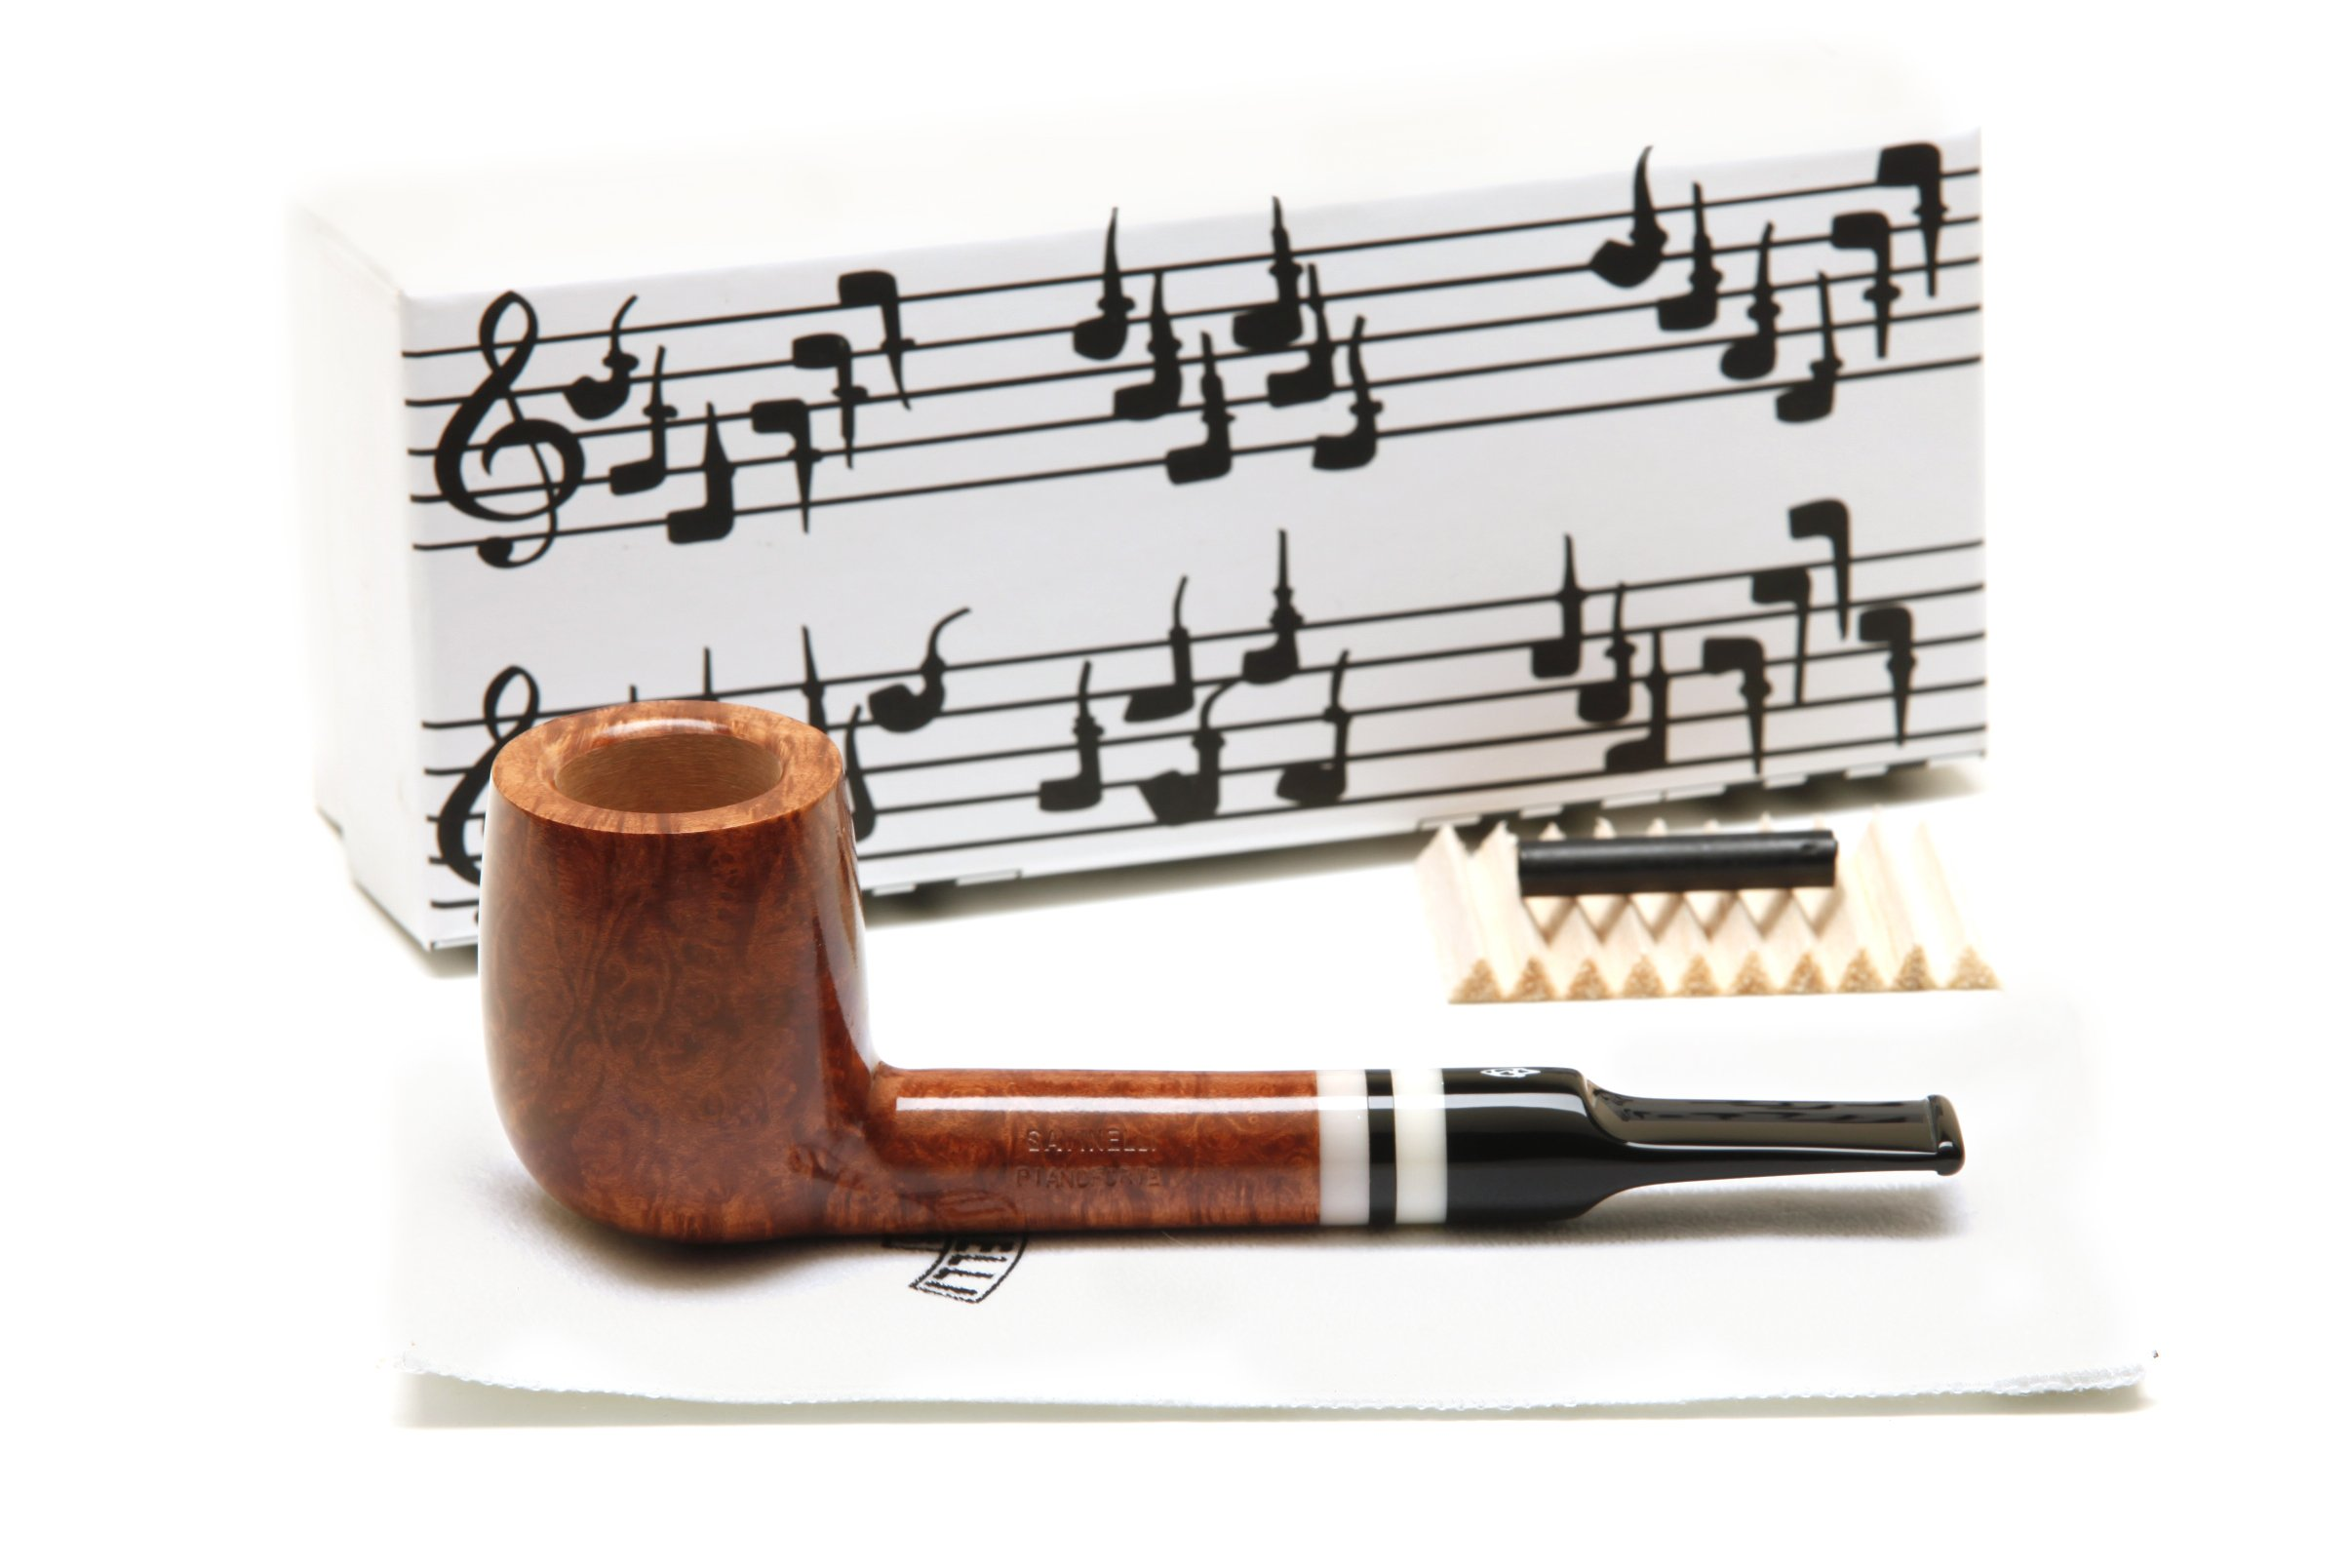 Savinelli Pianoforte 703 KS Smooth Tobacco Pipe